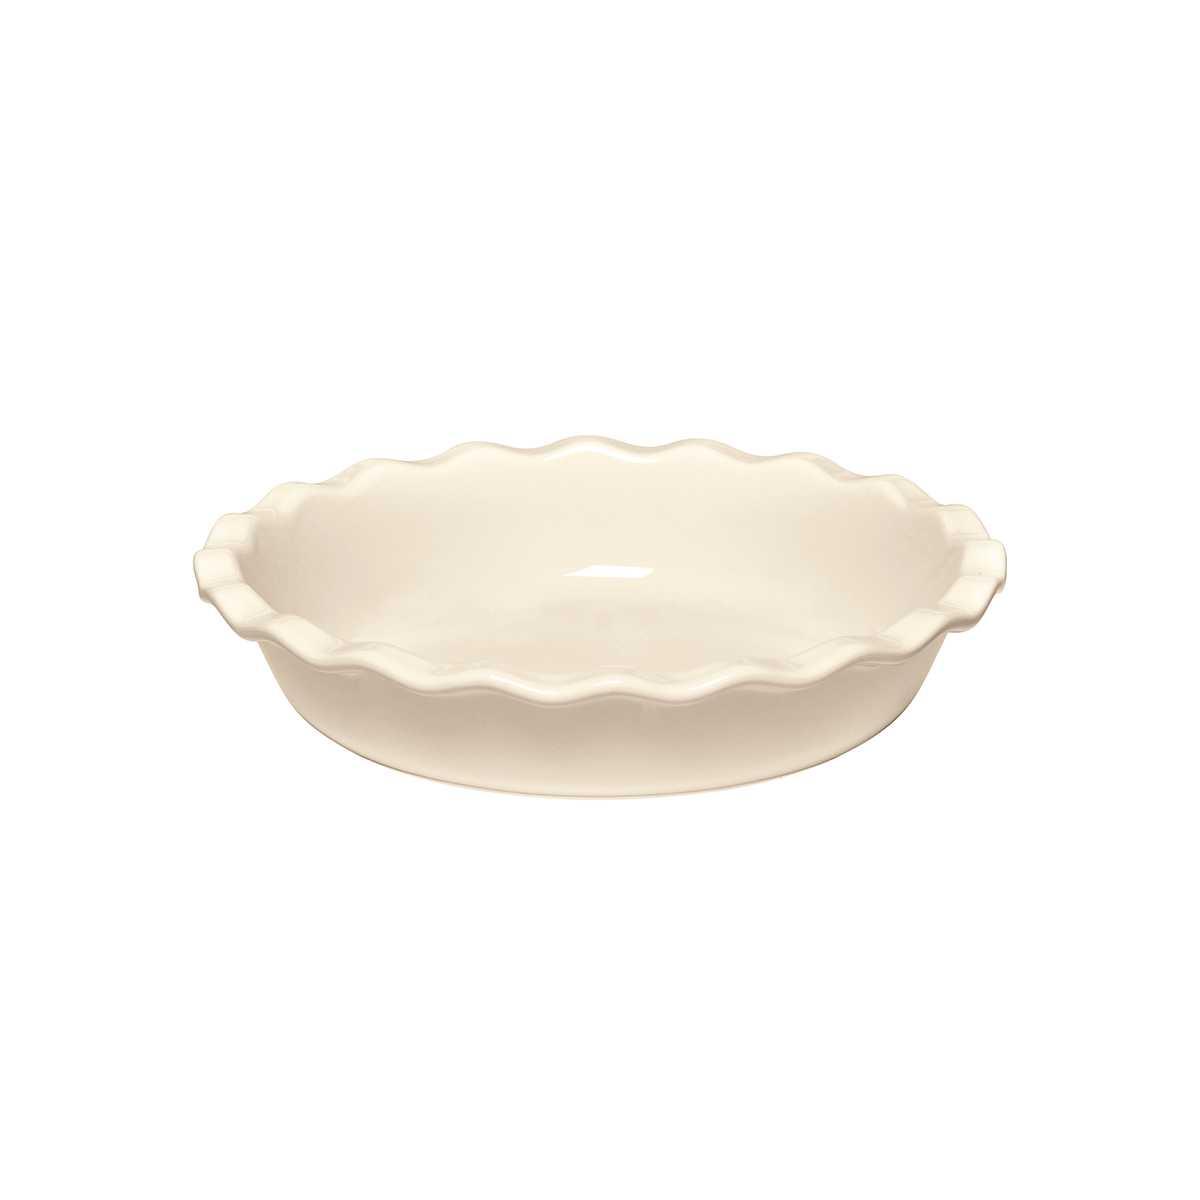 Онлайн каталог PROMENU: Форма для торта Emile Henry Ovenware (026131) Emile Henry 026131